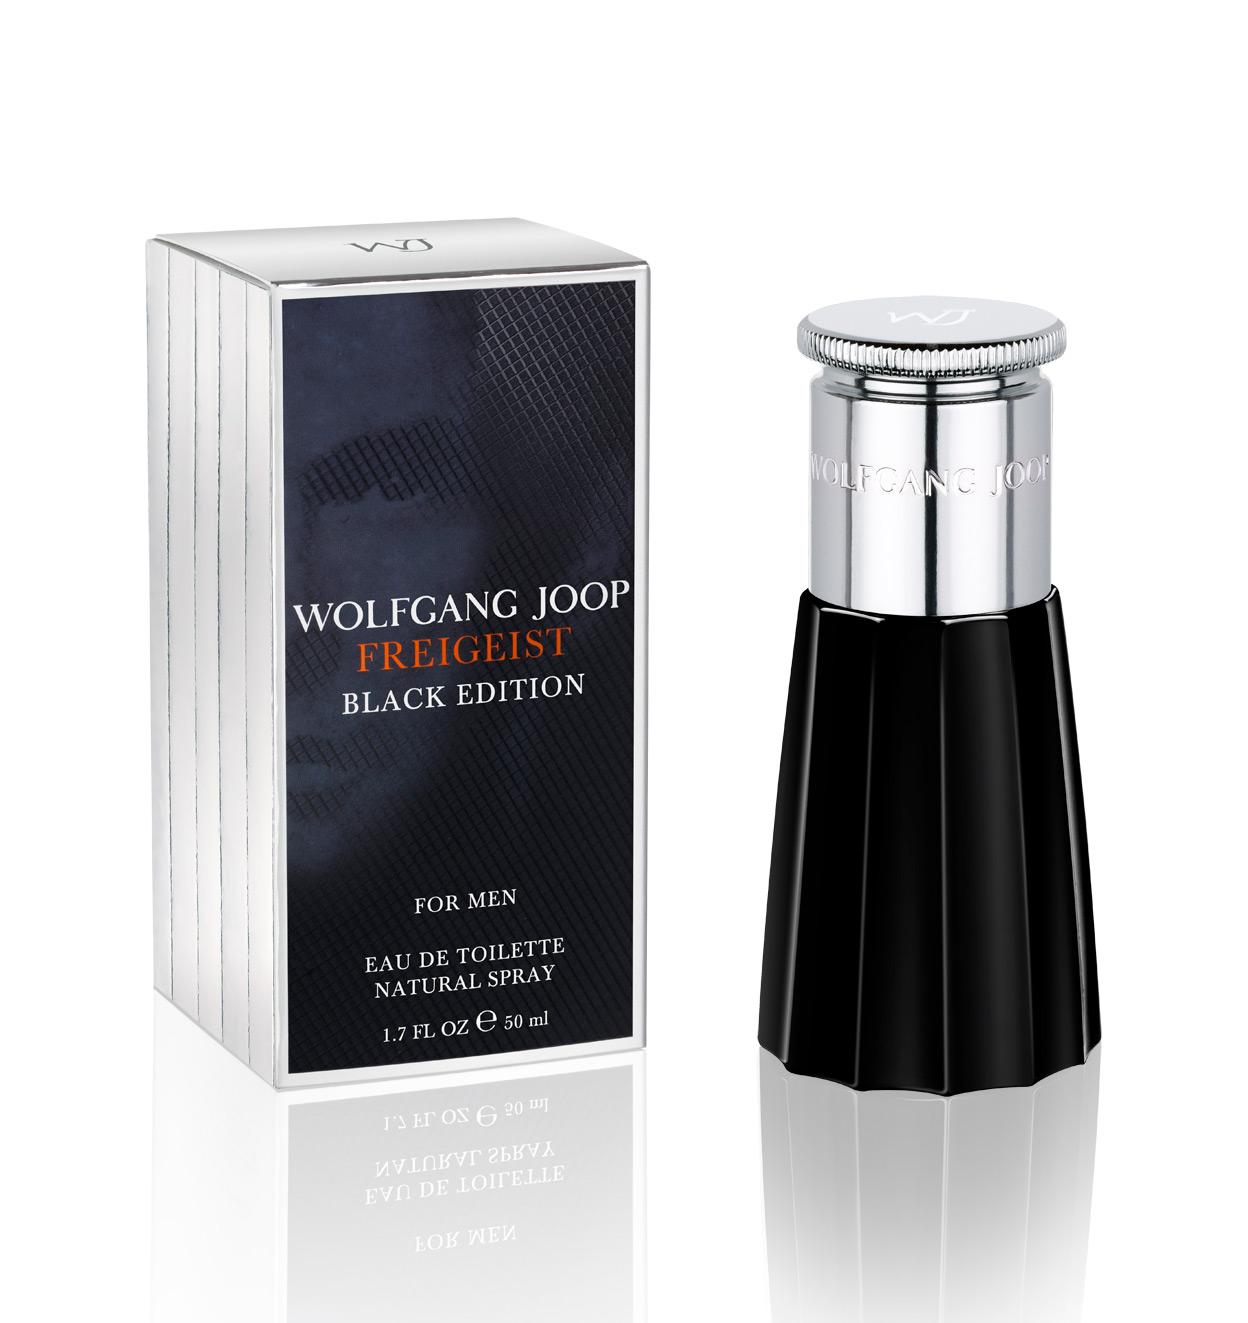 an vorderster Front der Zeit Super Qualität Super süße Wolfgang Joop Freigeist Black Edition Joop! for men